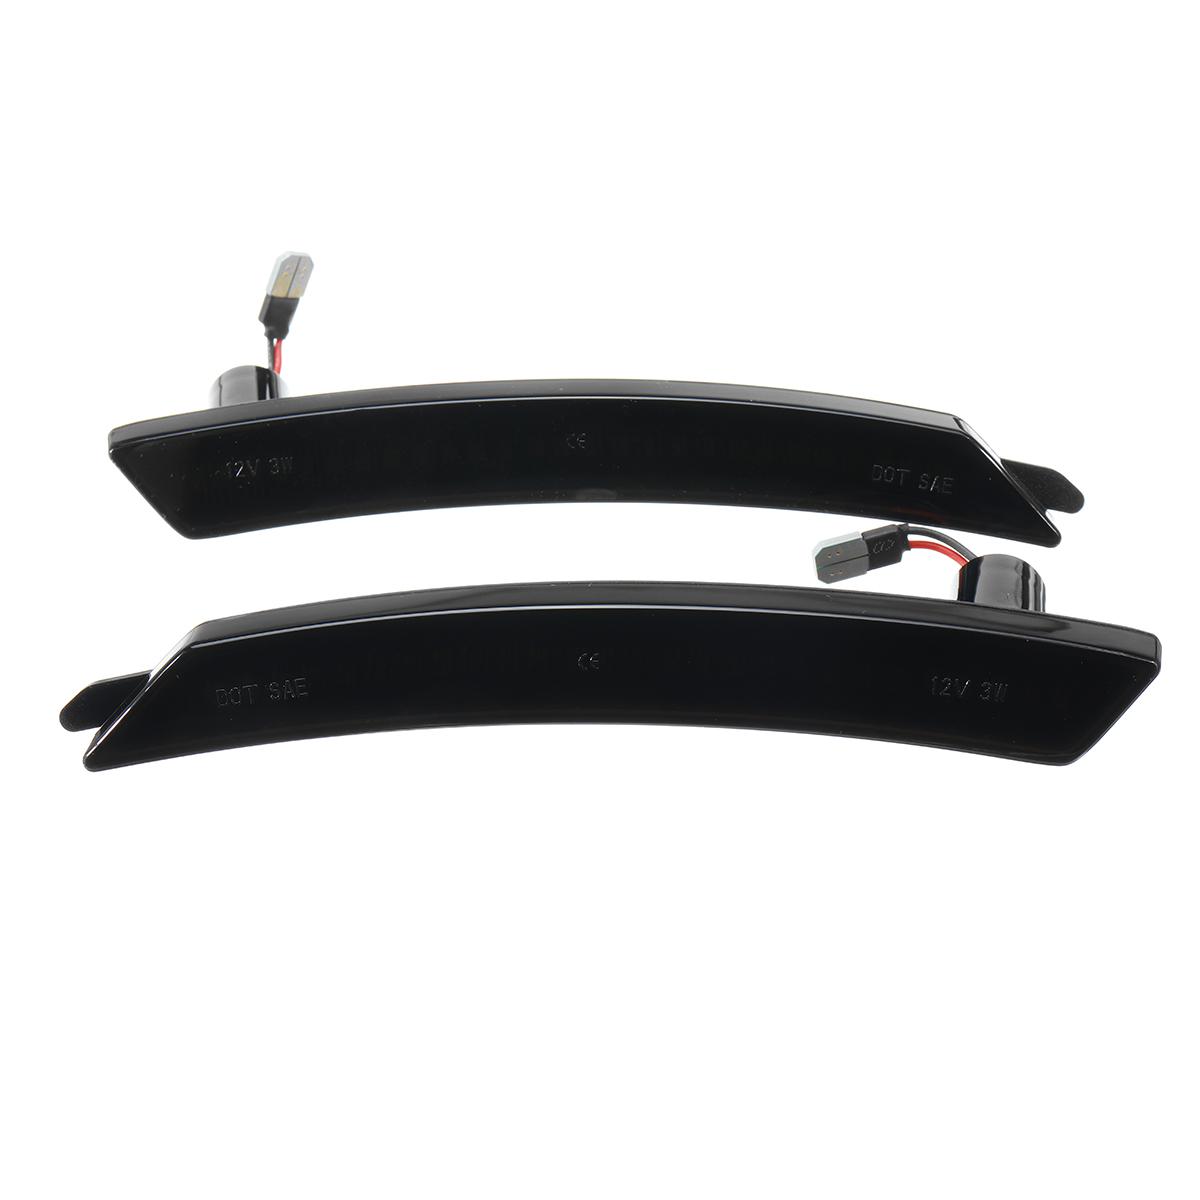 BMW Mini Cooper R55 R56 R57 R58 R59 R60 Sensormatte 2755393